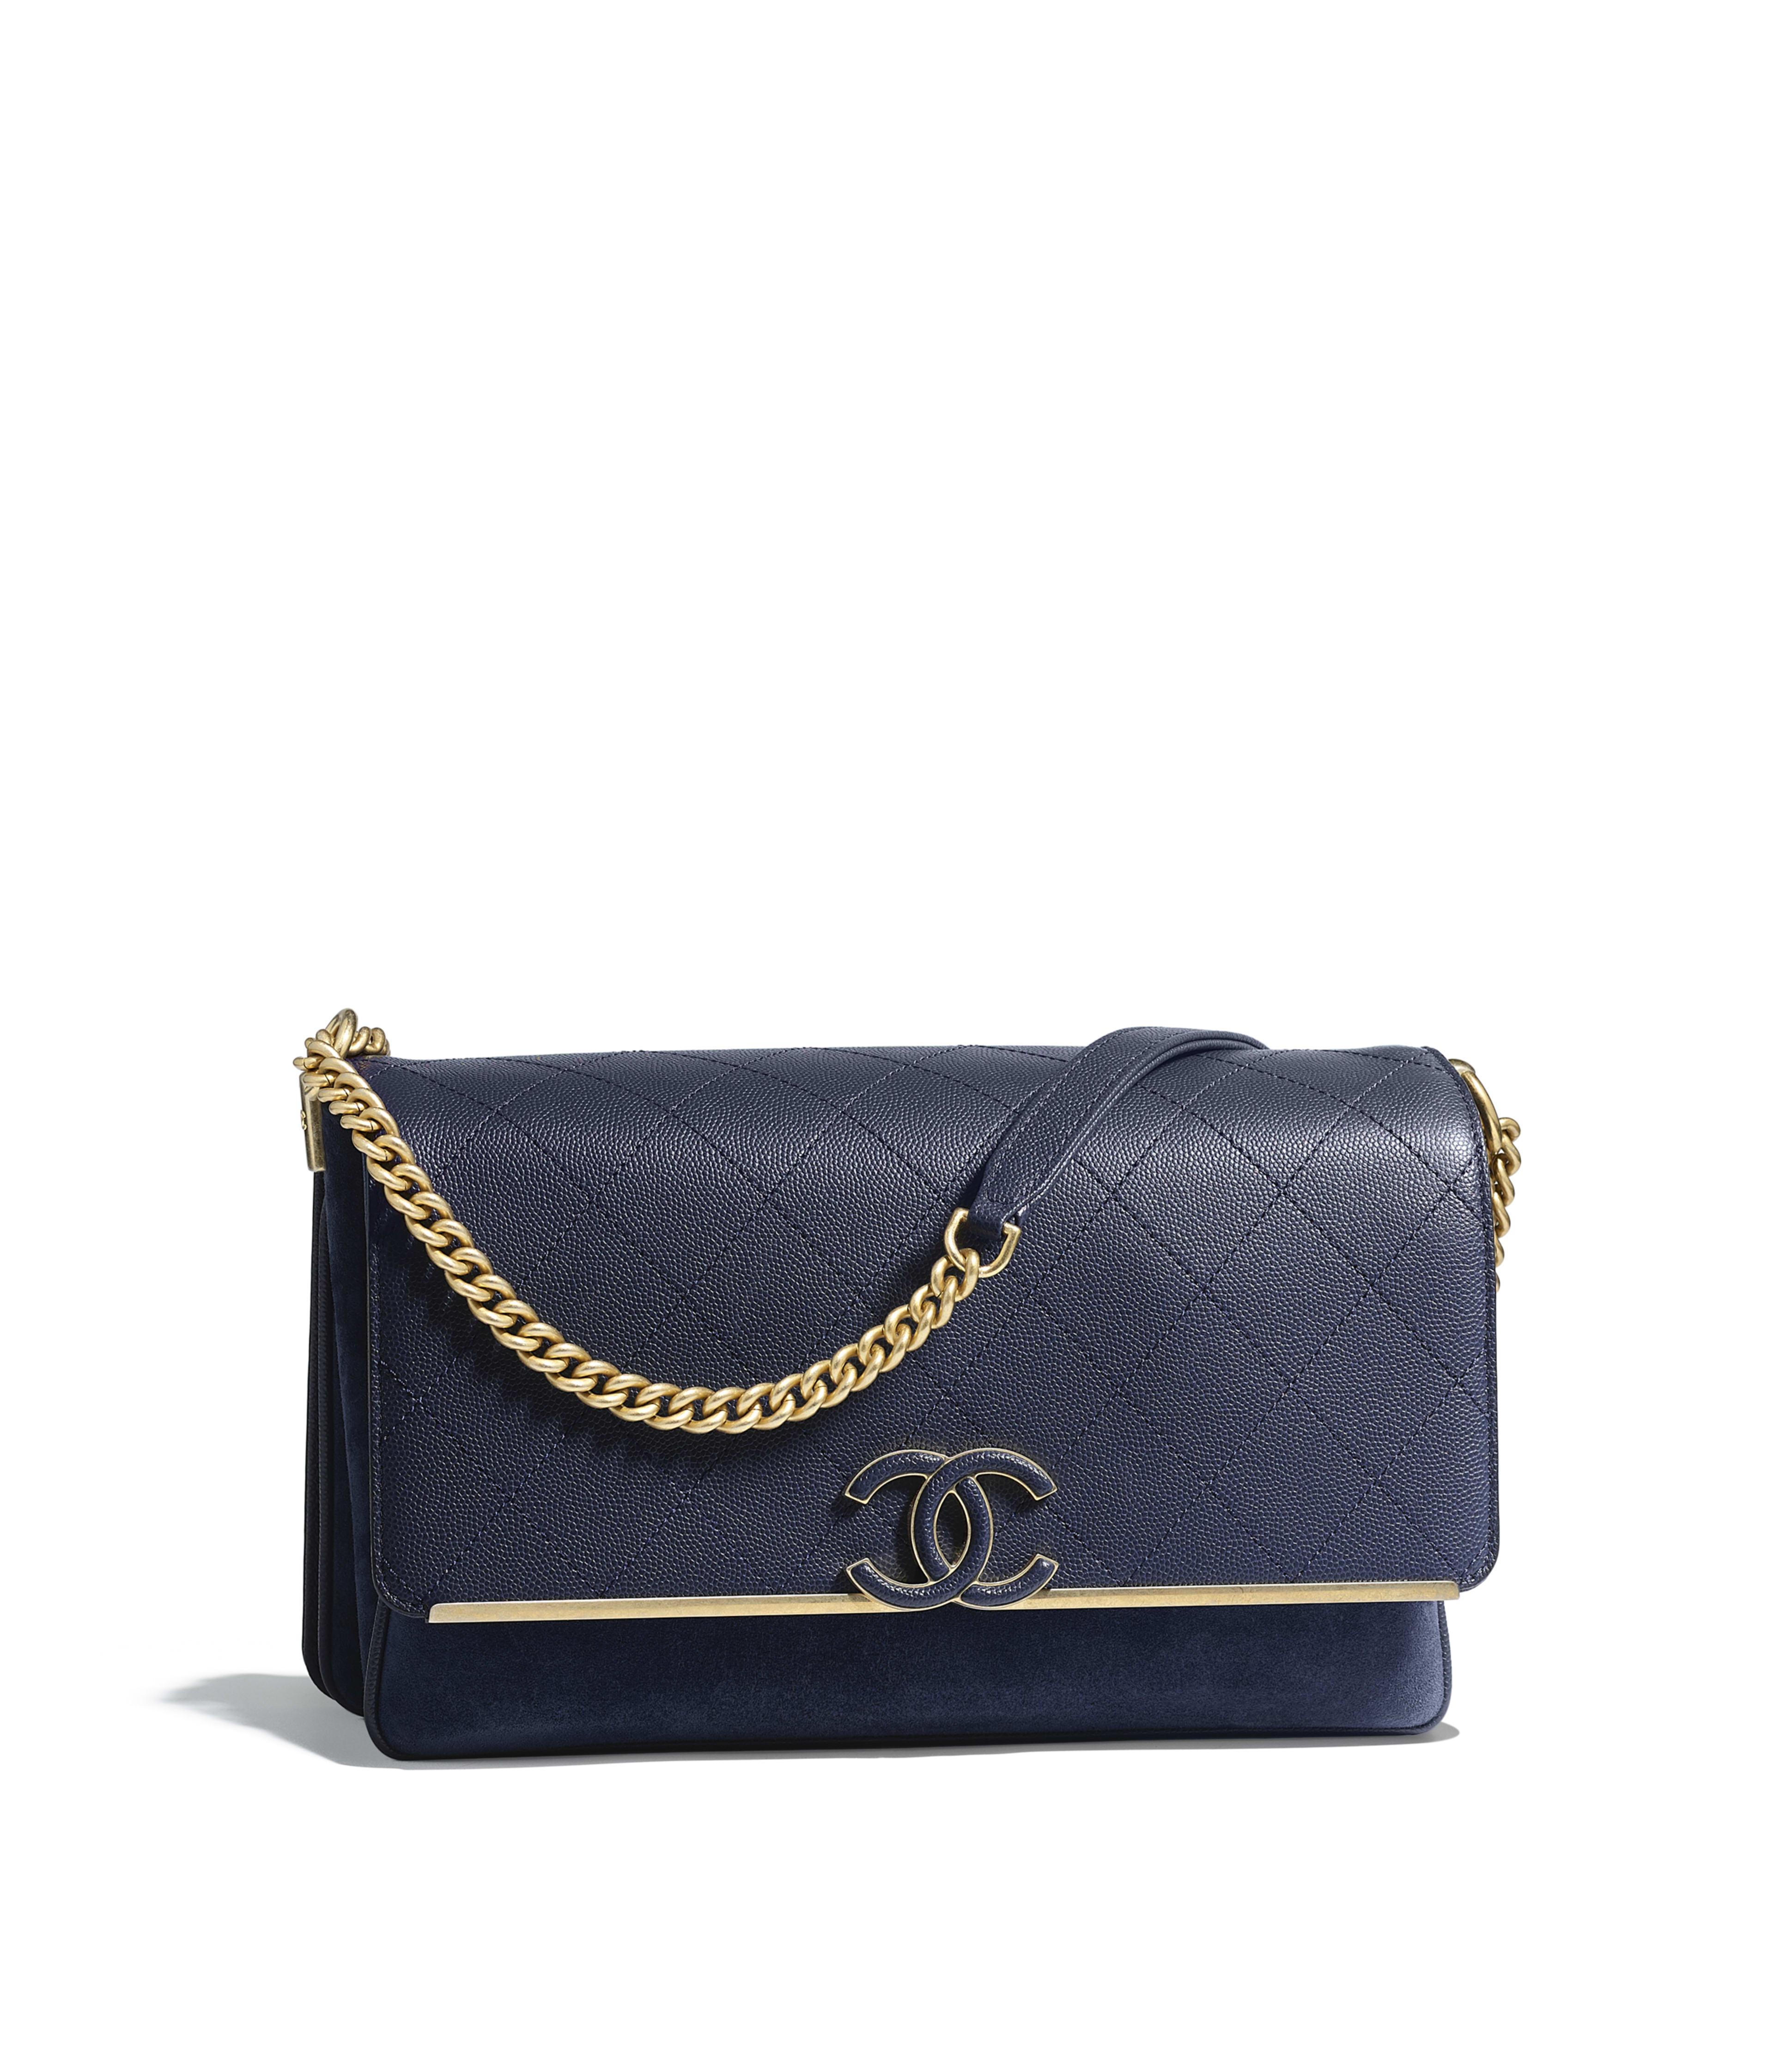 Flap Bag Grained Calfskin Suede Gold Tone Metal Navy Blue Ref A57561y333575b313